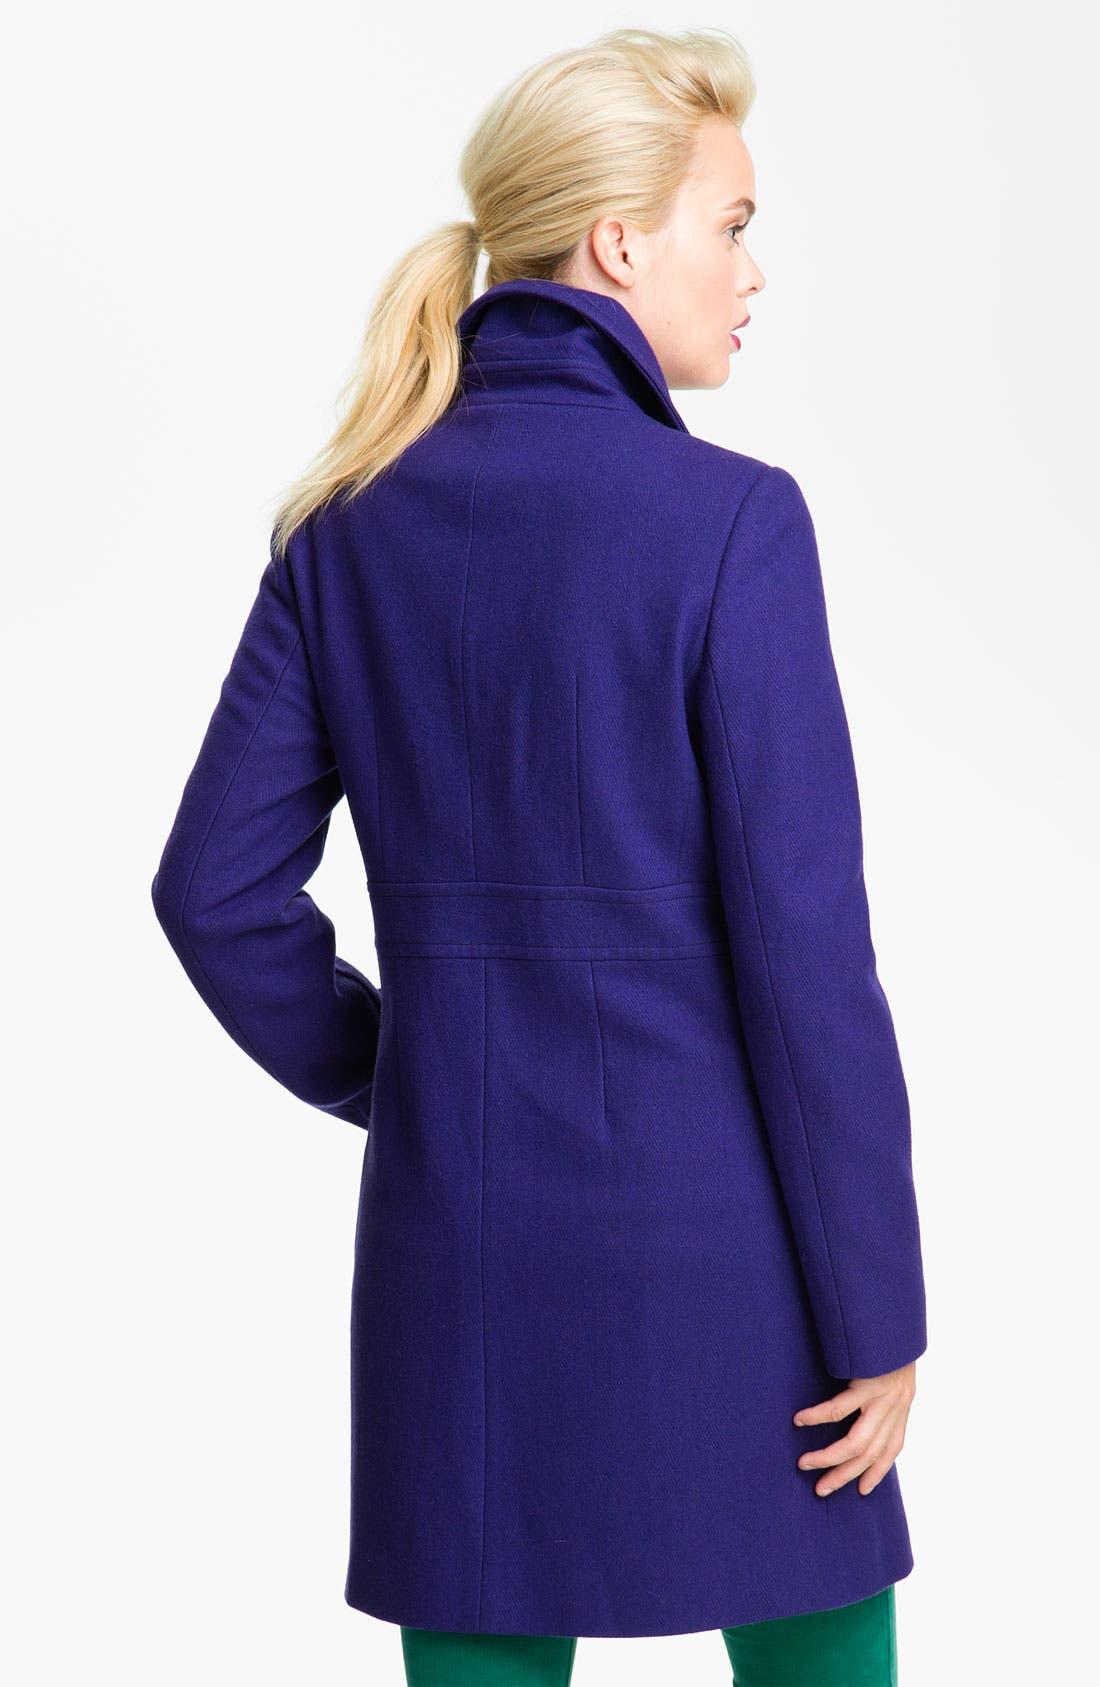 Alternate Image 2  - DKNY 'Kendra' Turnkey Wool Blend Coat (Nordstrom Exclusive)